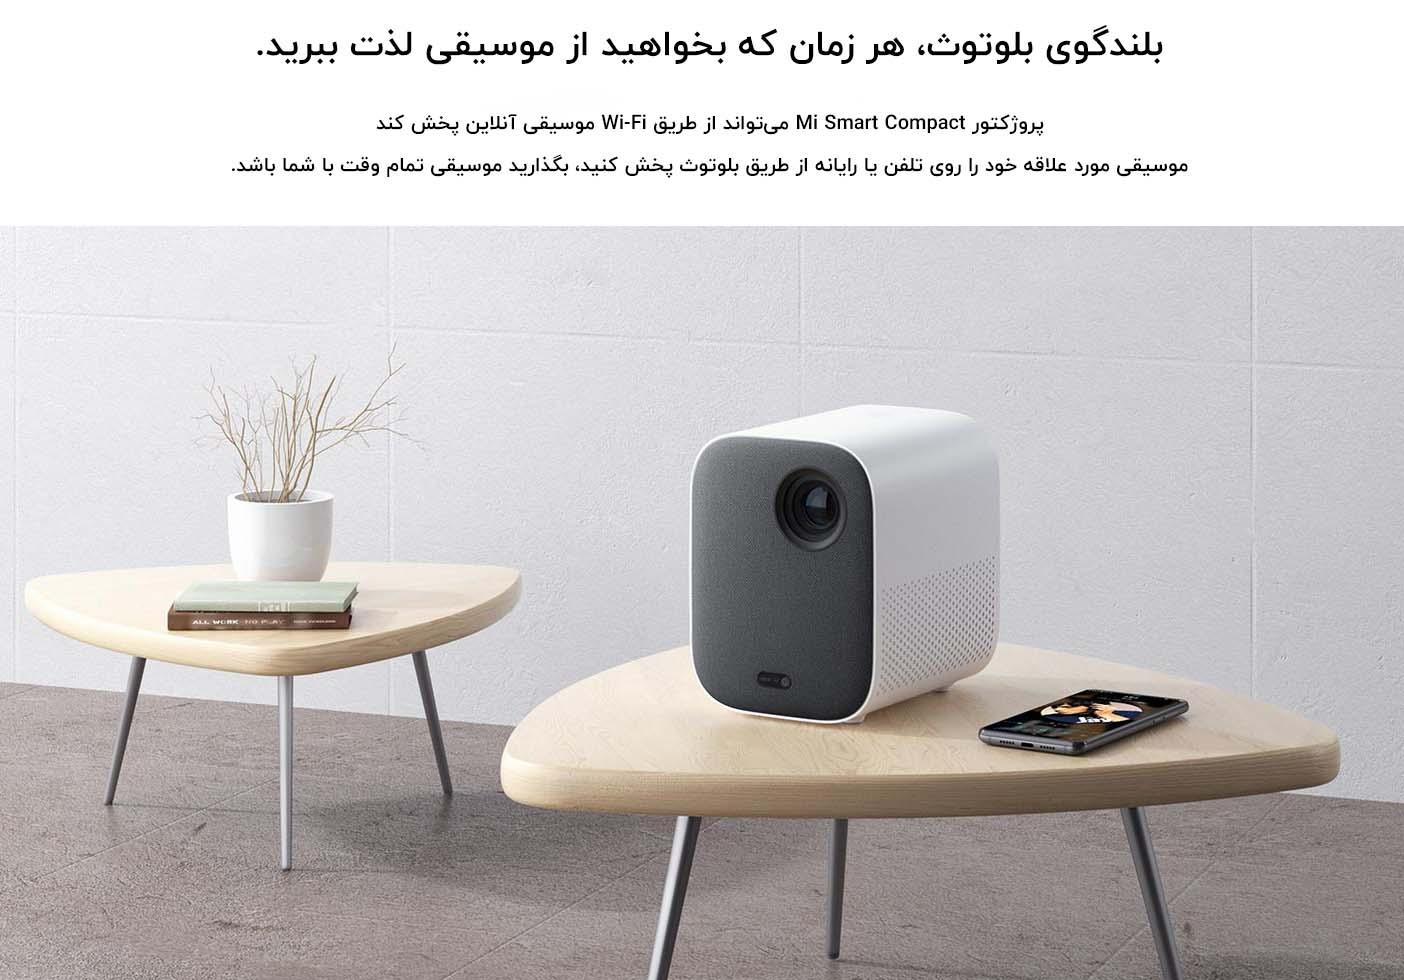 پروژکتور شیائومی Mi Smart Compact Projector